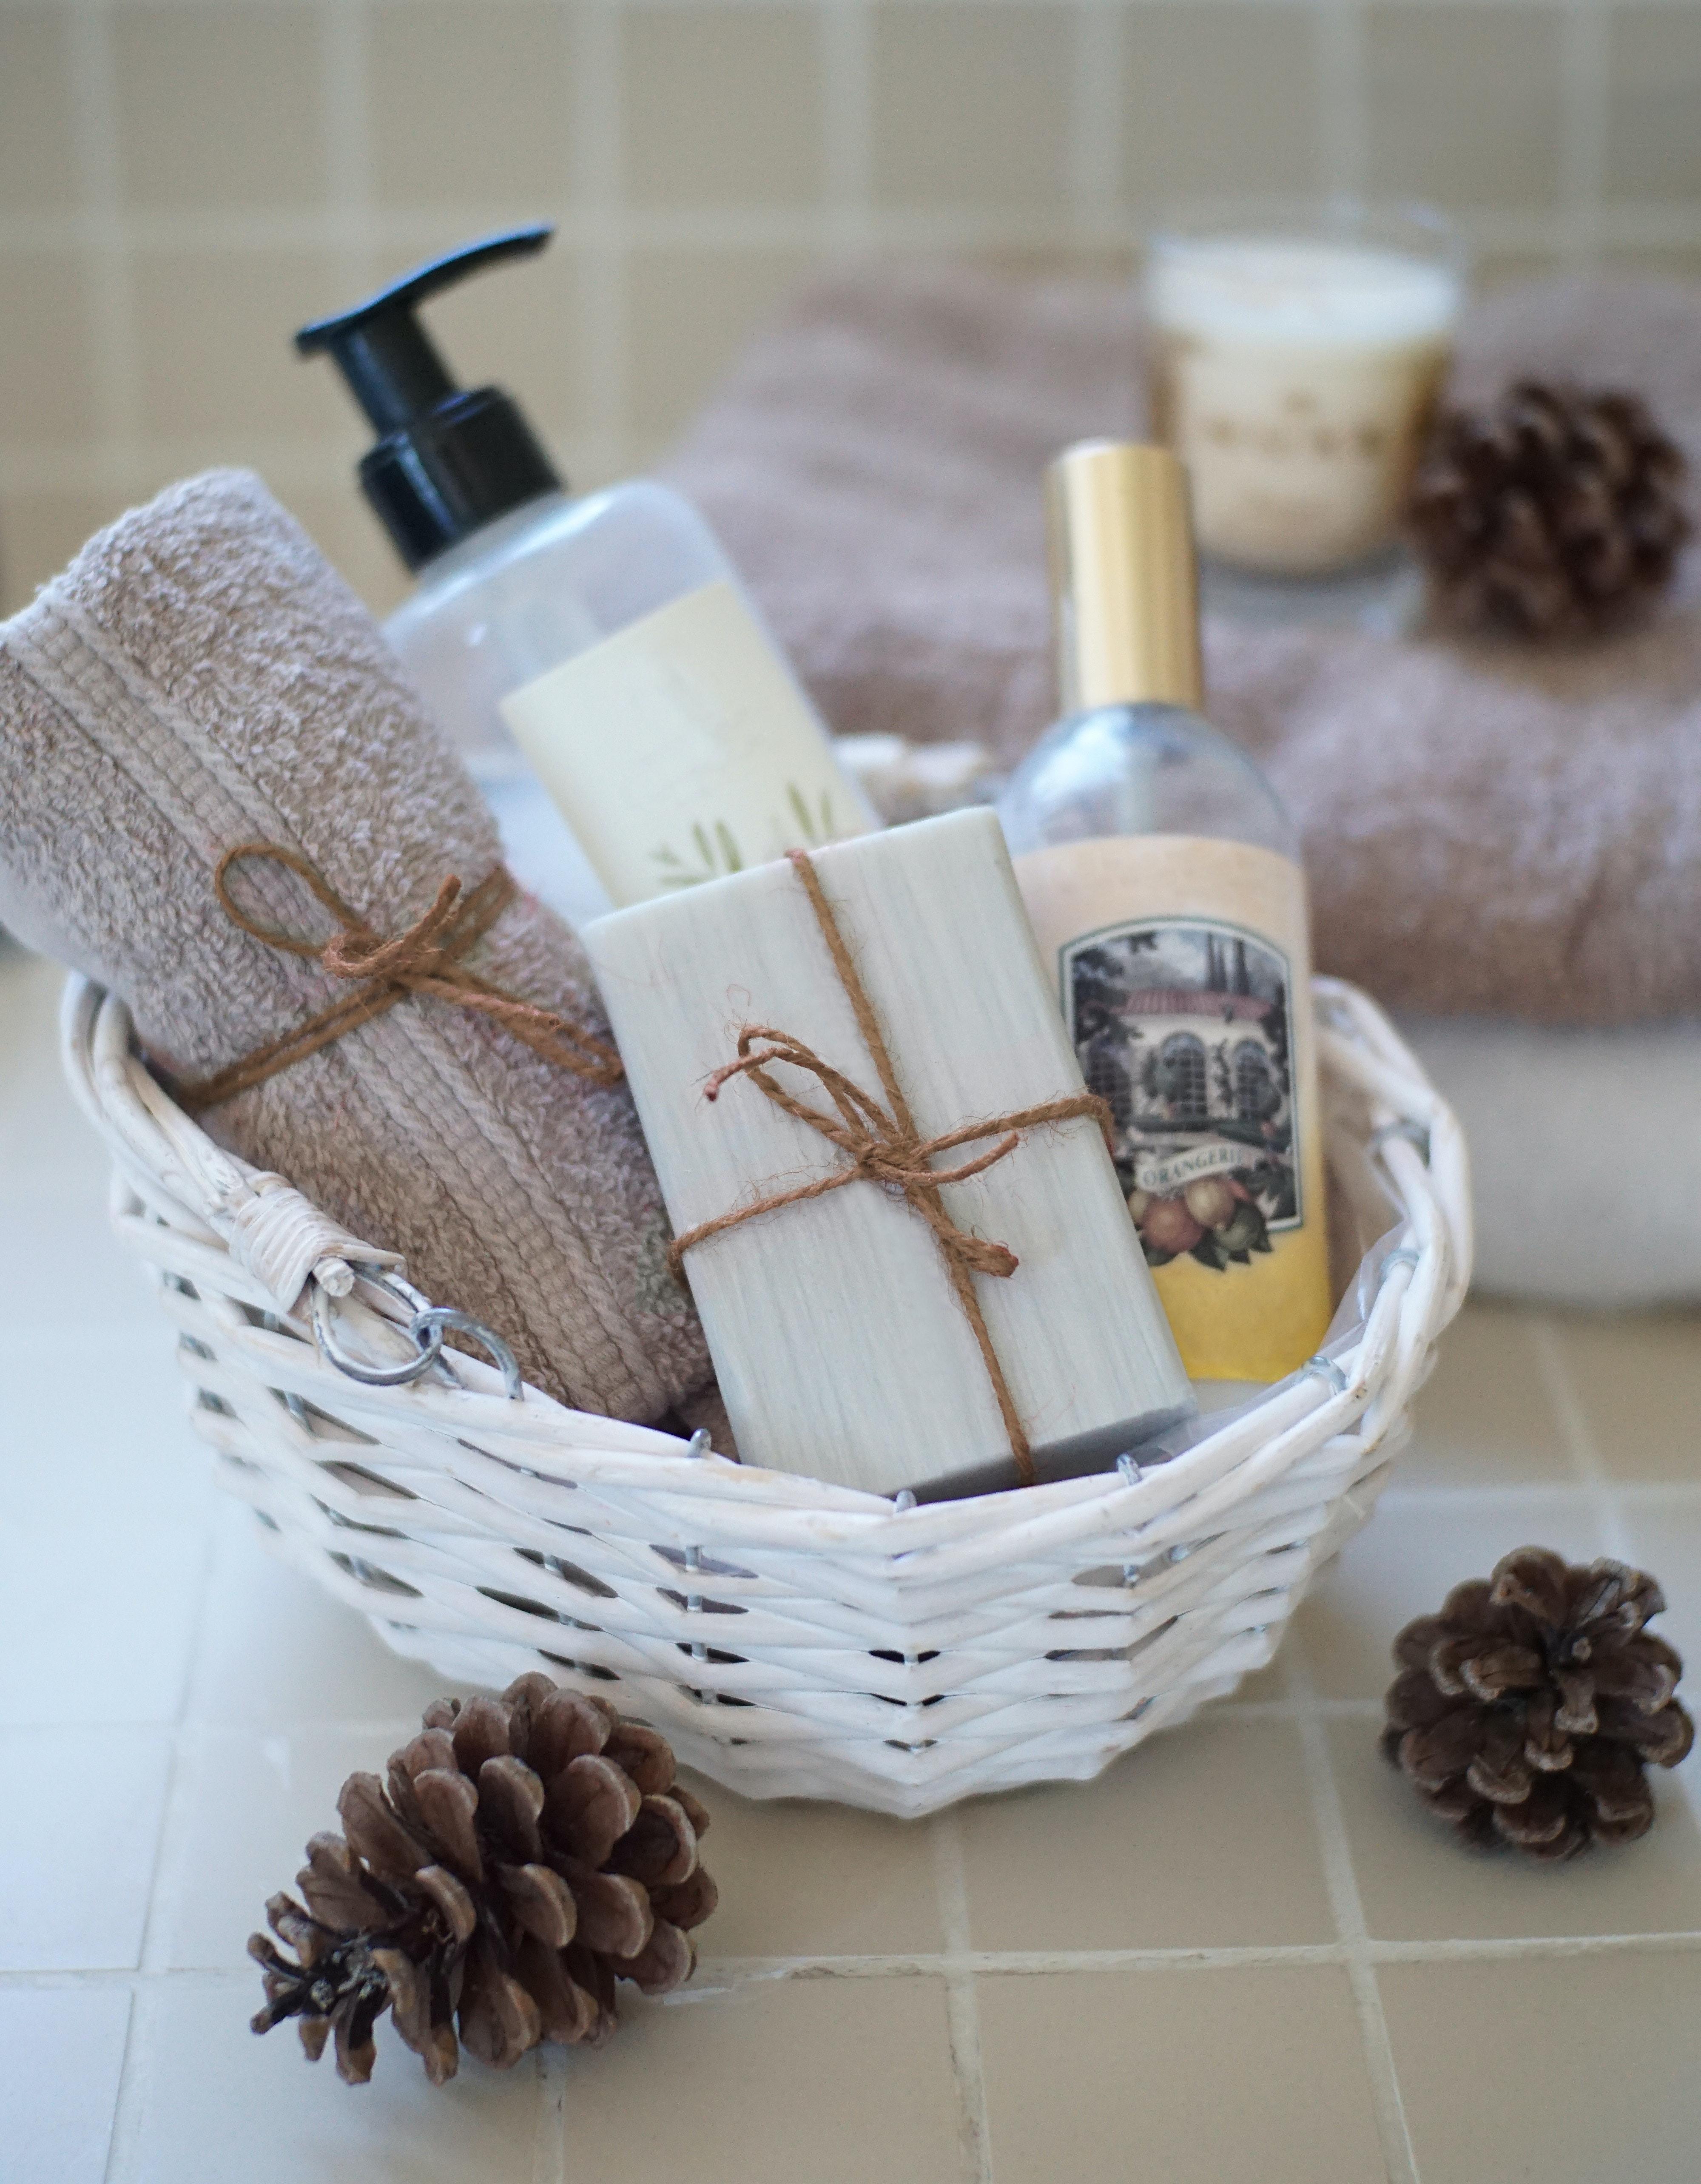 soft furnishing in the bathroom for fall season